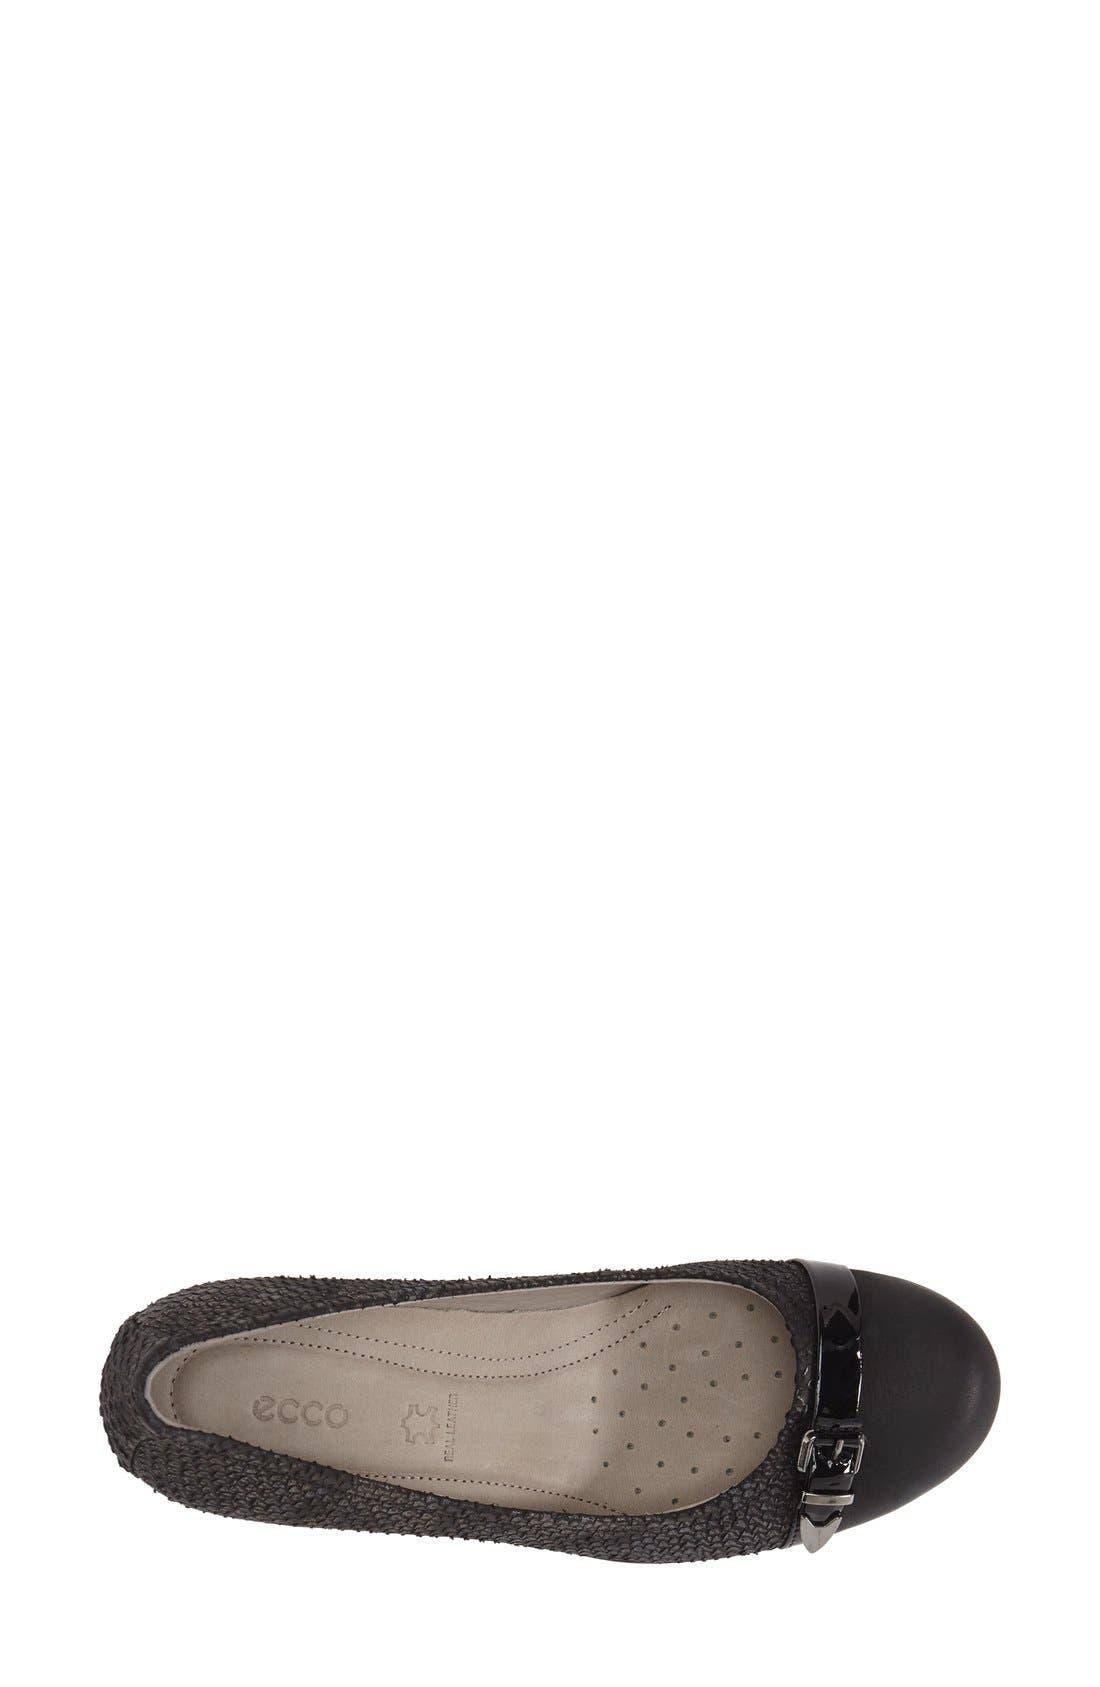 'Touch 50' Buckle Pump,                             Alternate thumbnail 3, color,                             Black Leather